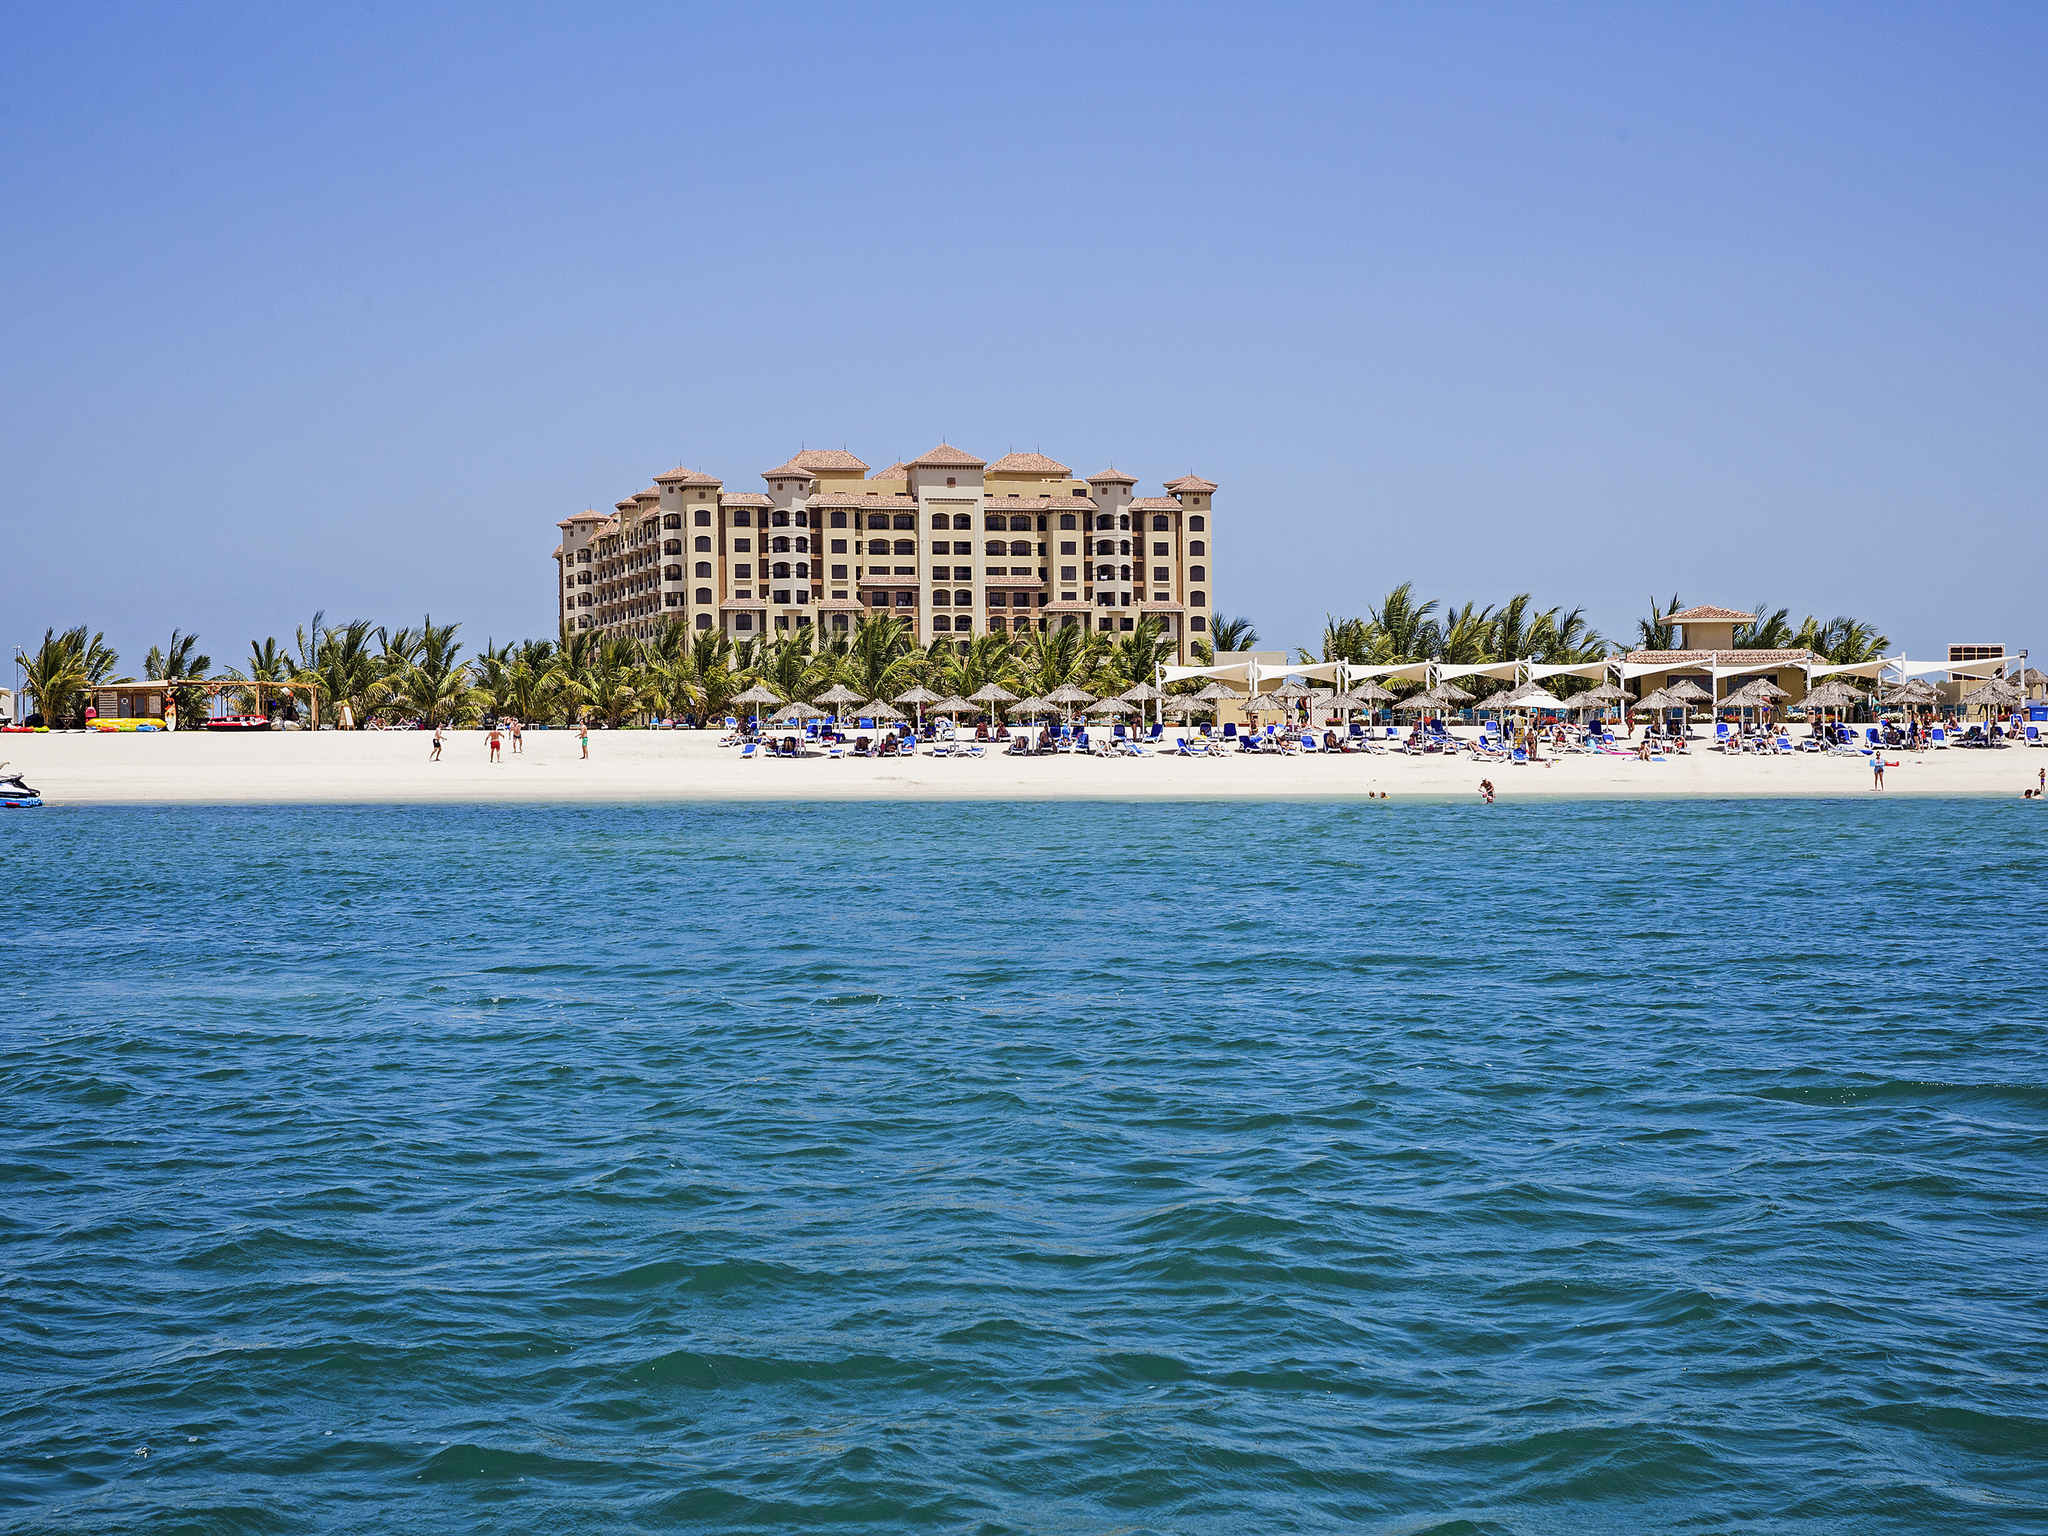 Hotel – Marjan Island Resort & Spa gestito da AccorHotels